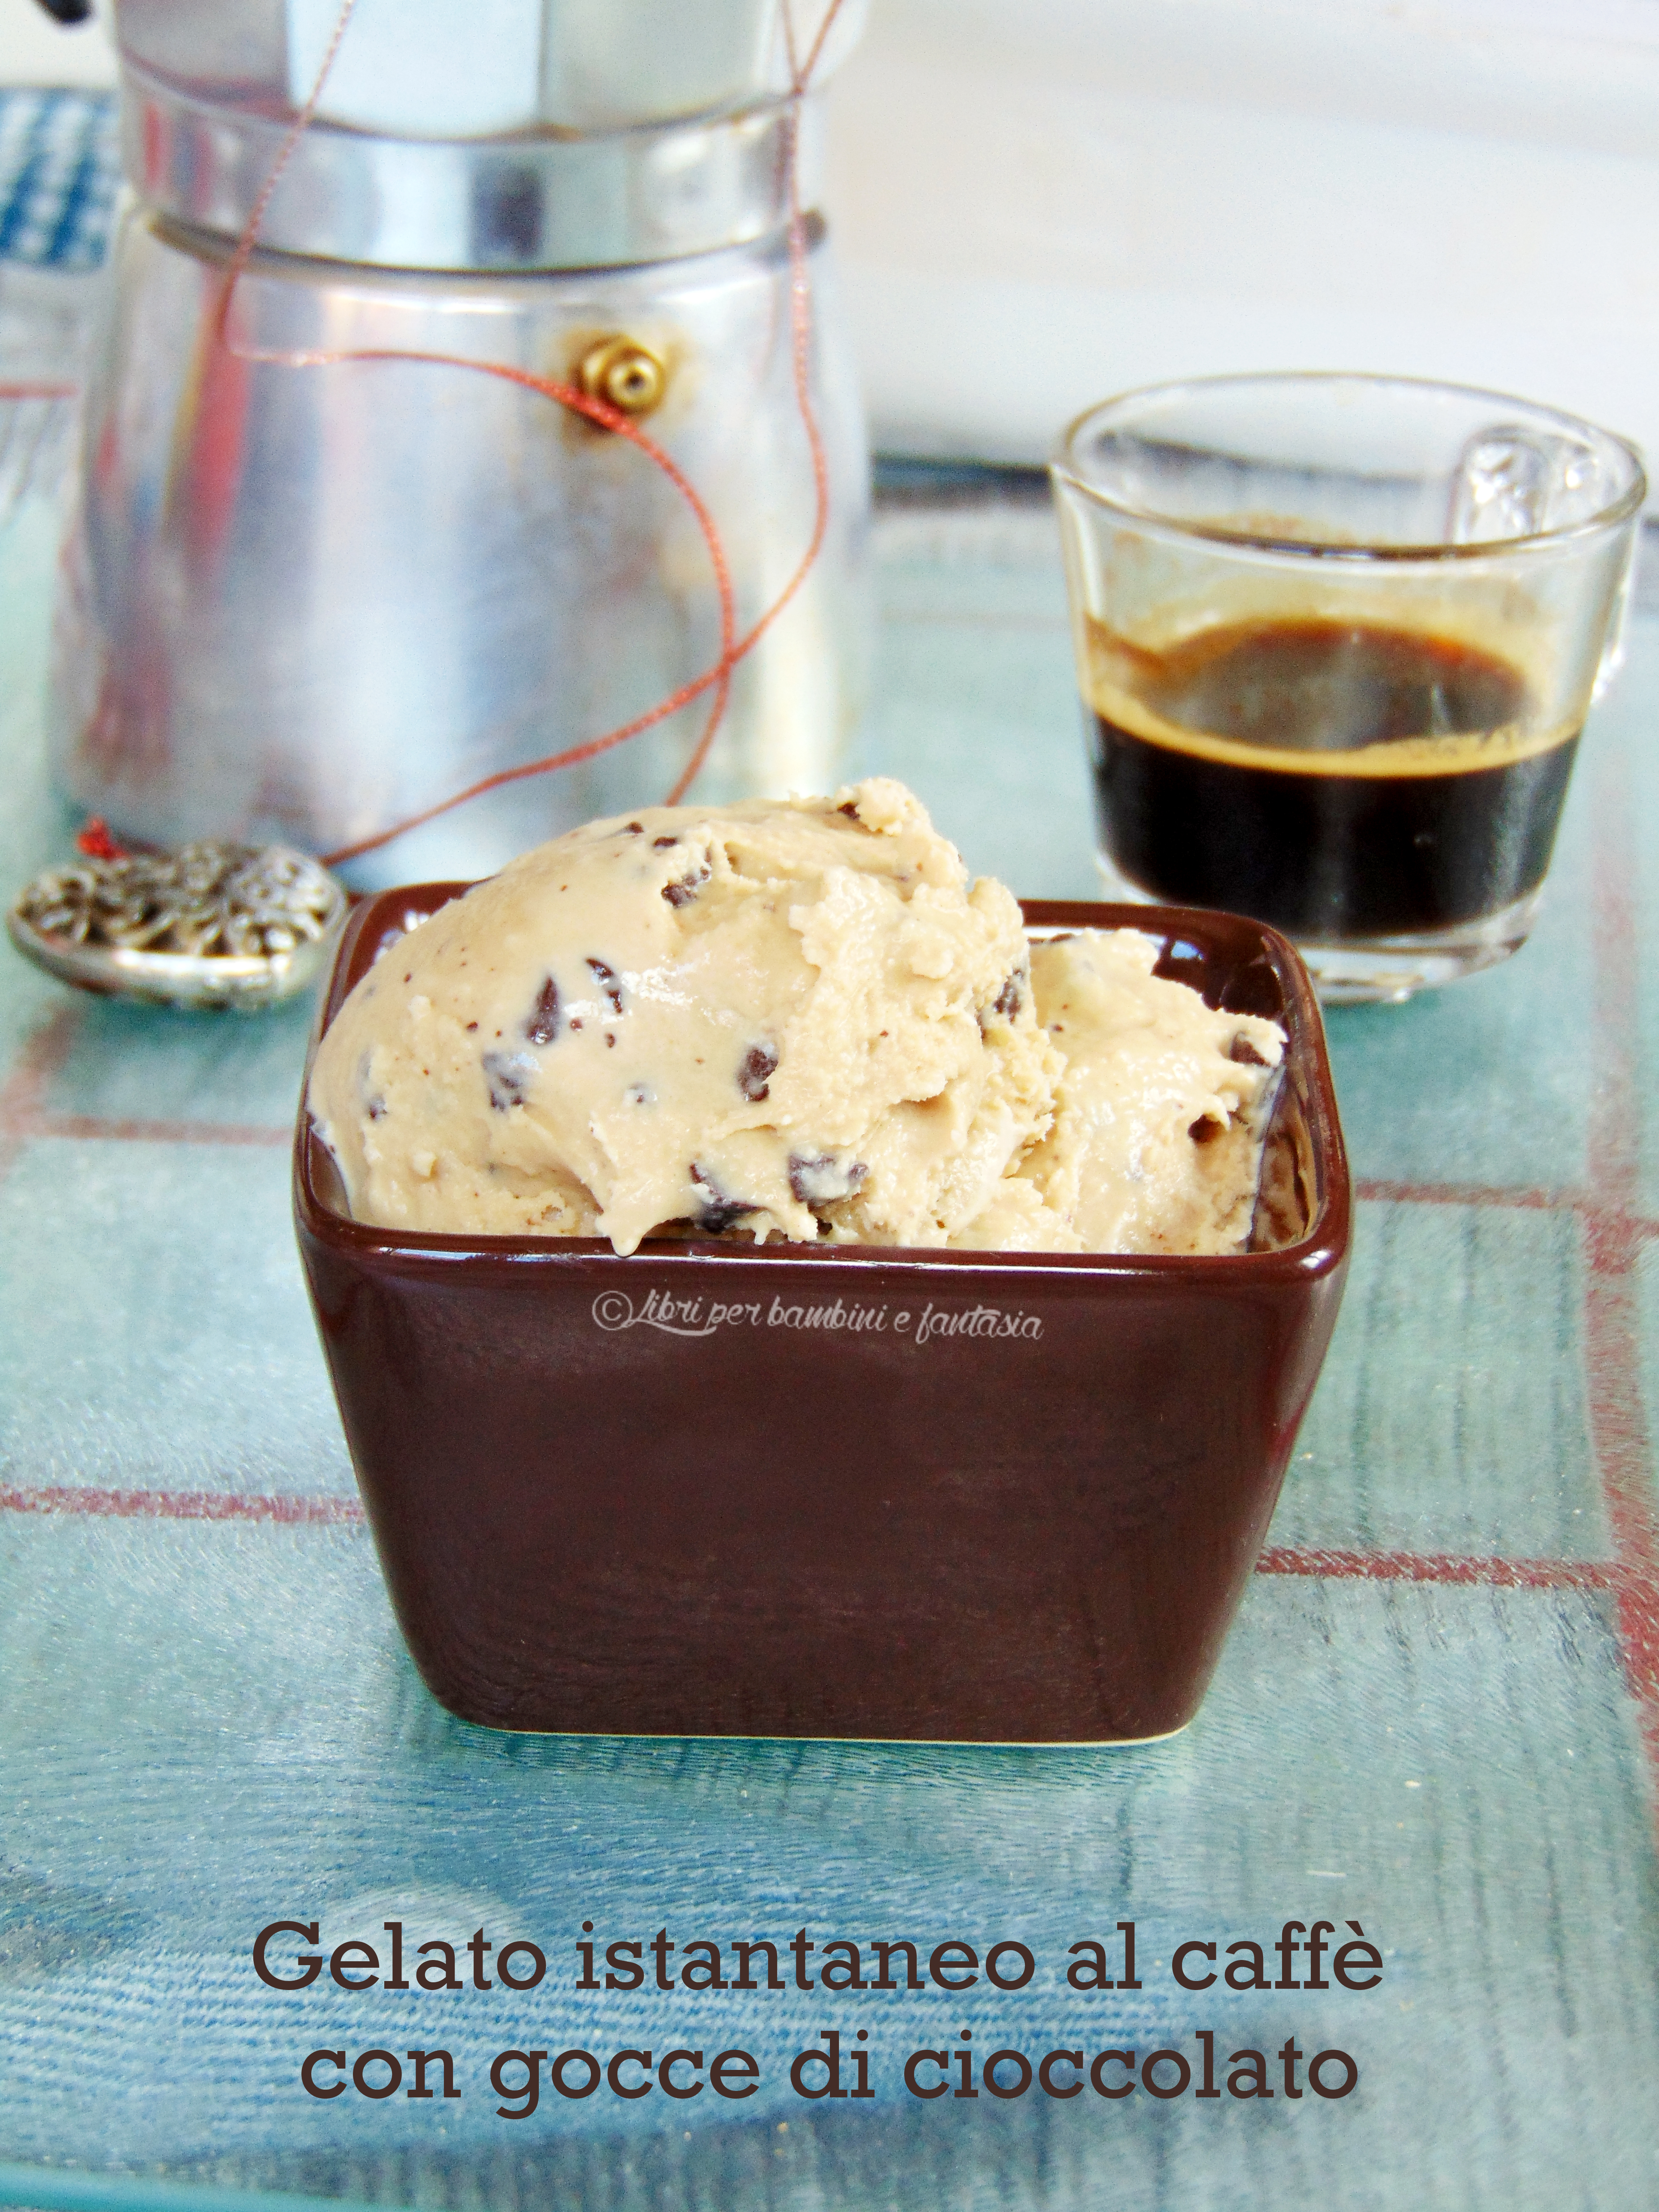 gelato al caffè 4